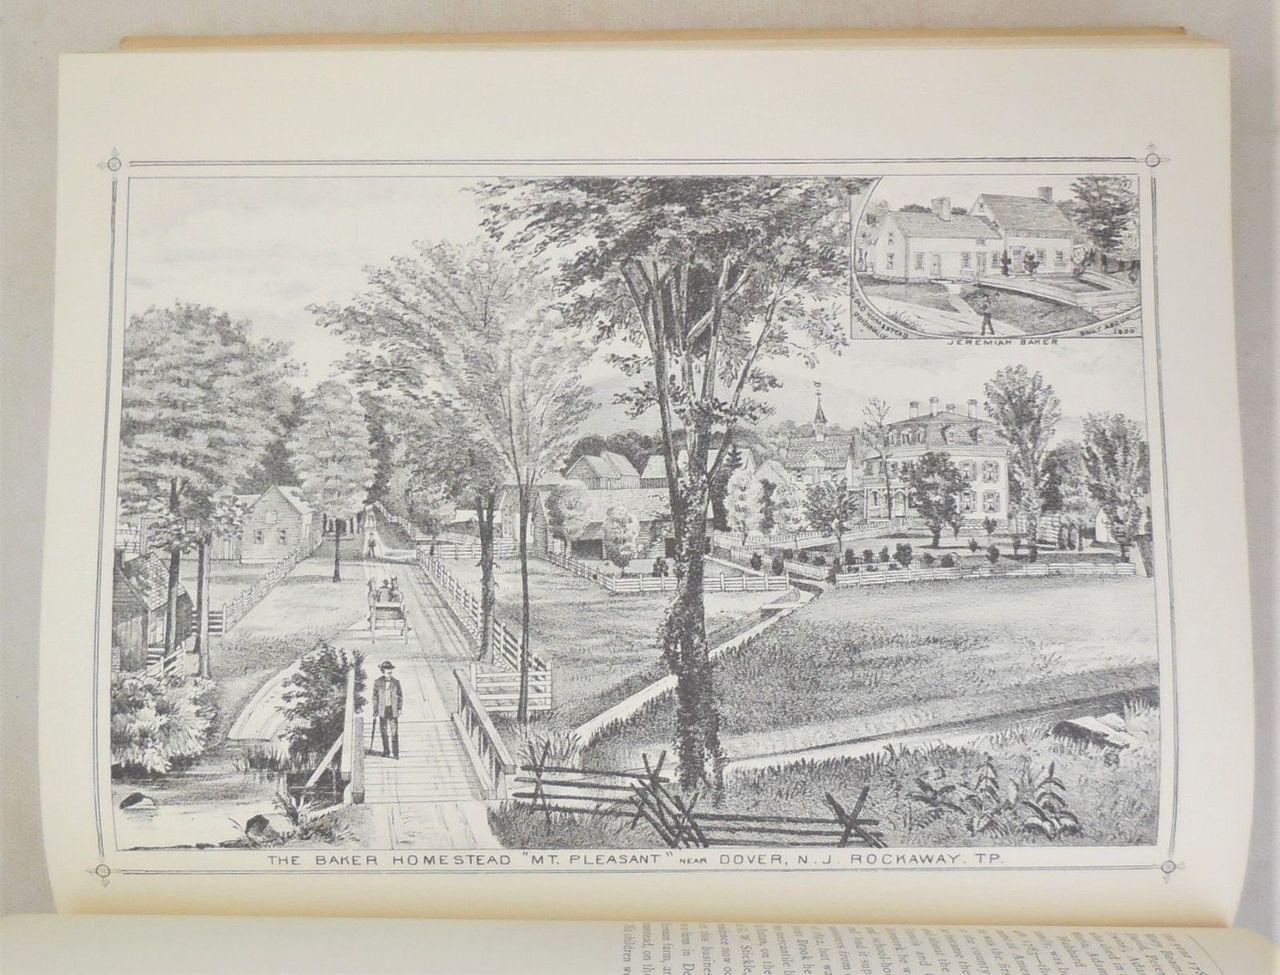 HISTORY OF MORRIS COUNTY, NJ (1739-1882) - 1882